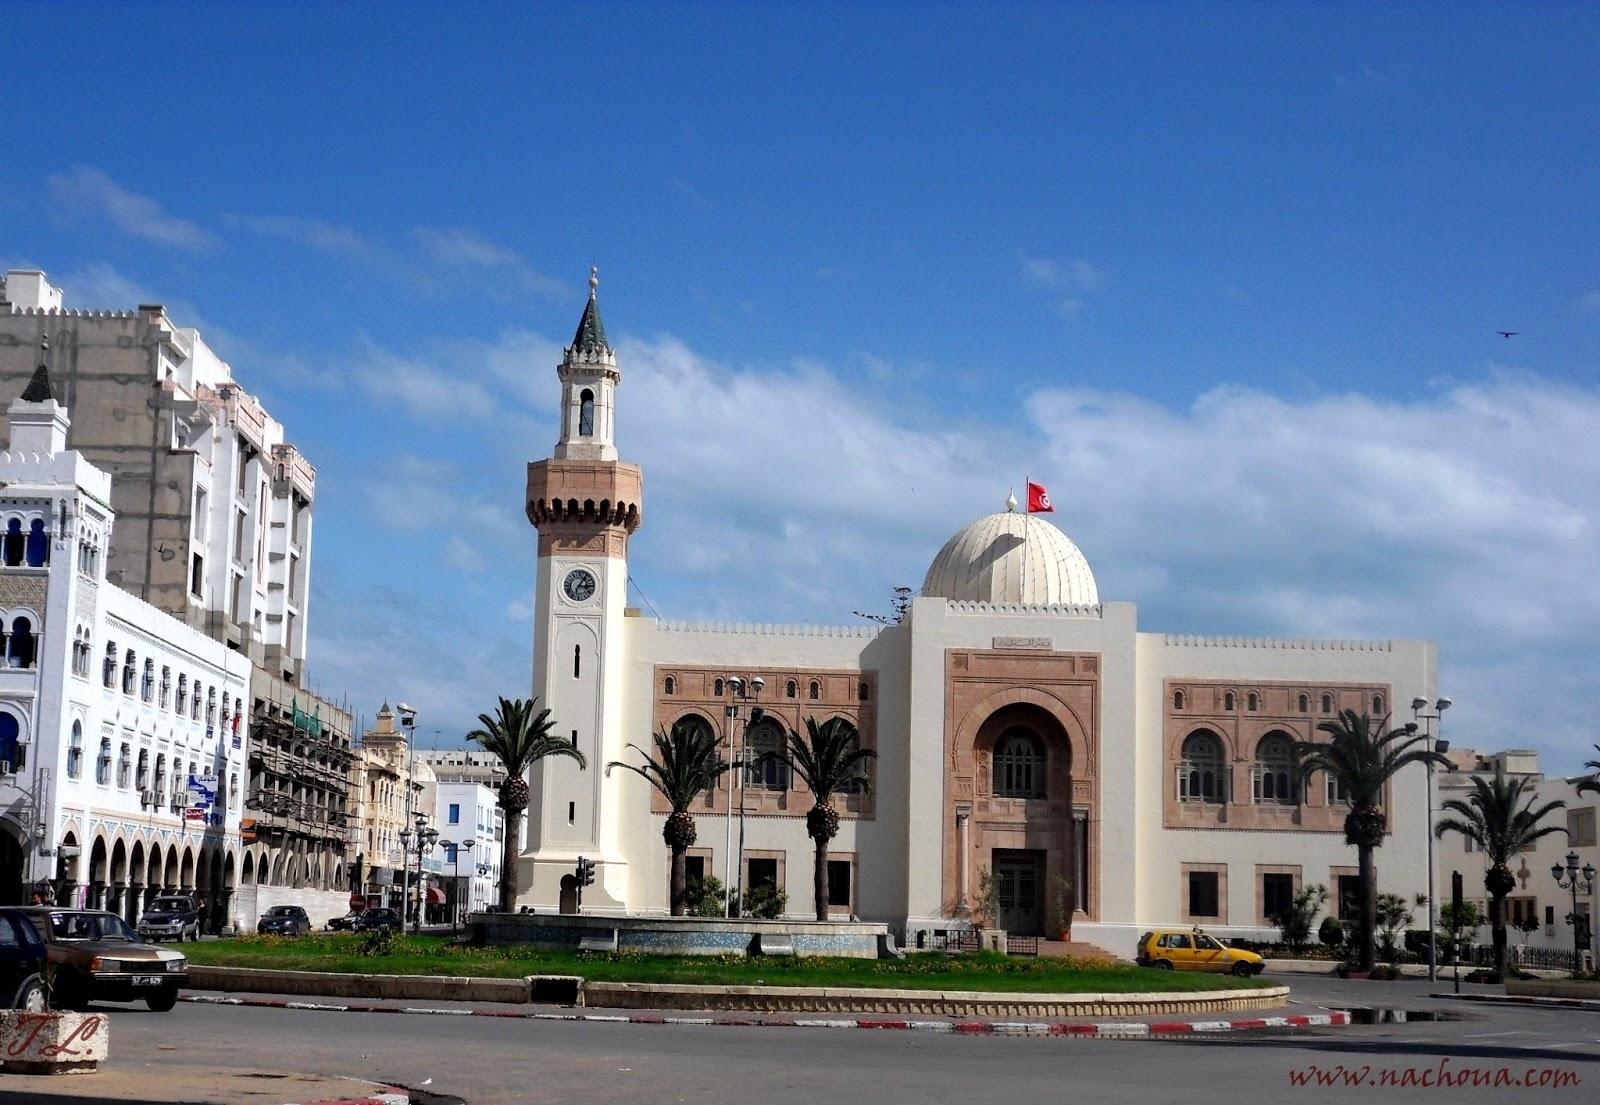 Culture et patrimoine de tunisie en images mohamed for Piscine demontable tunisie